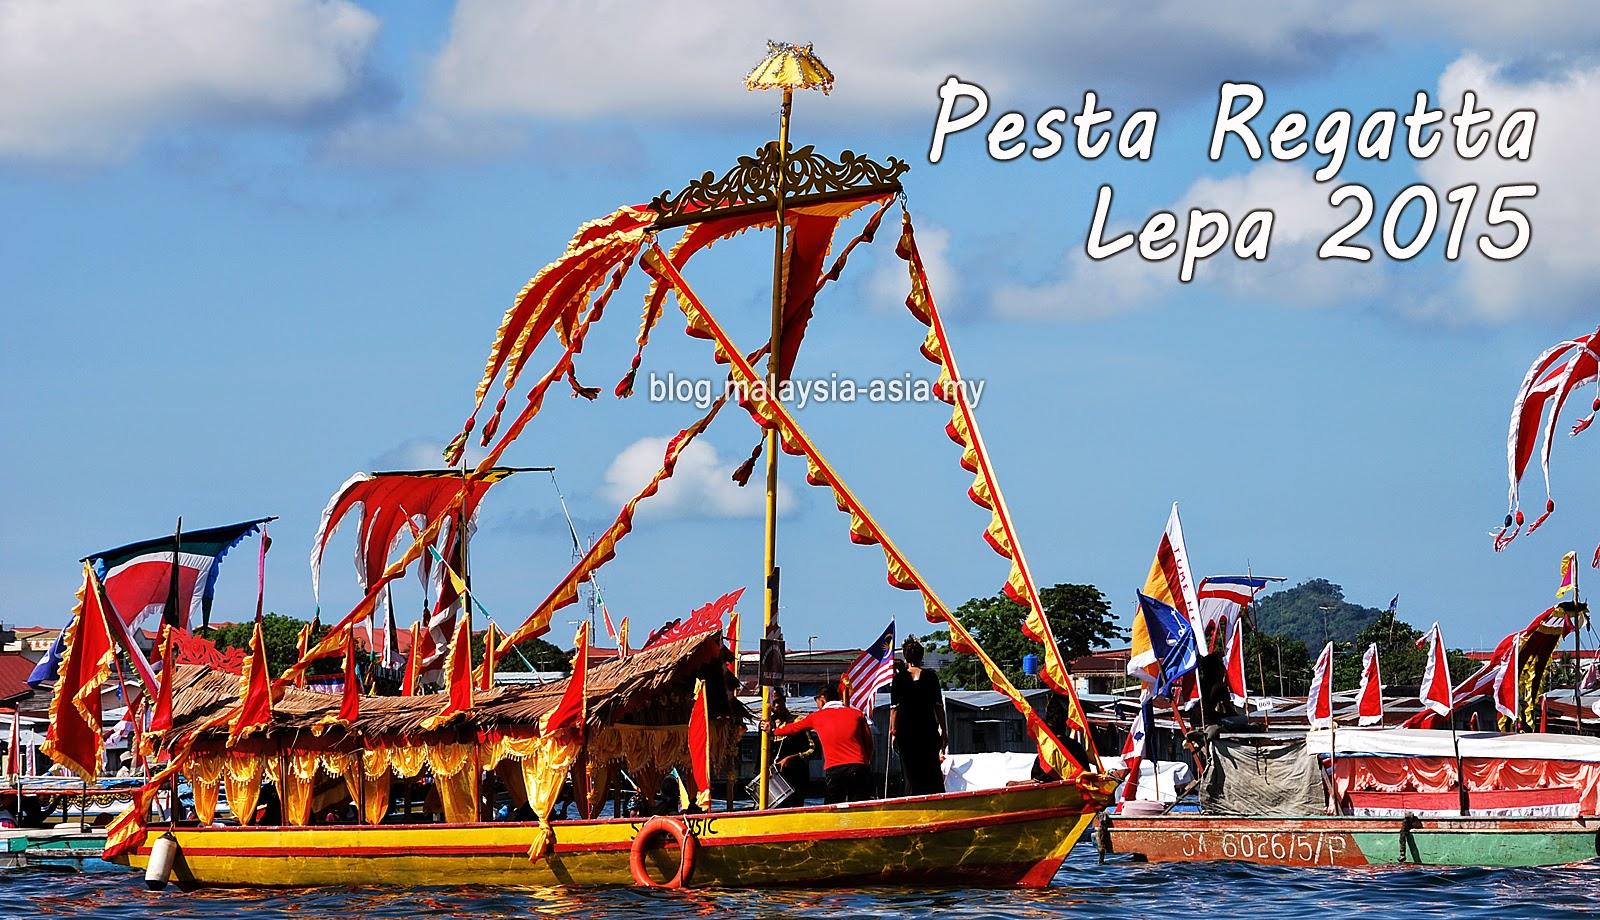 Regatta Lepa 2015 Sabah